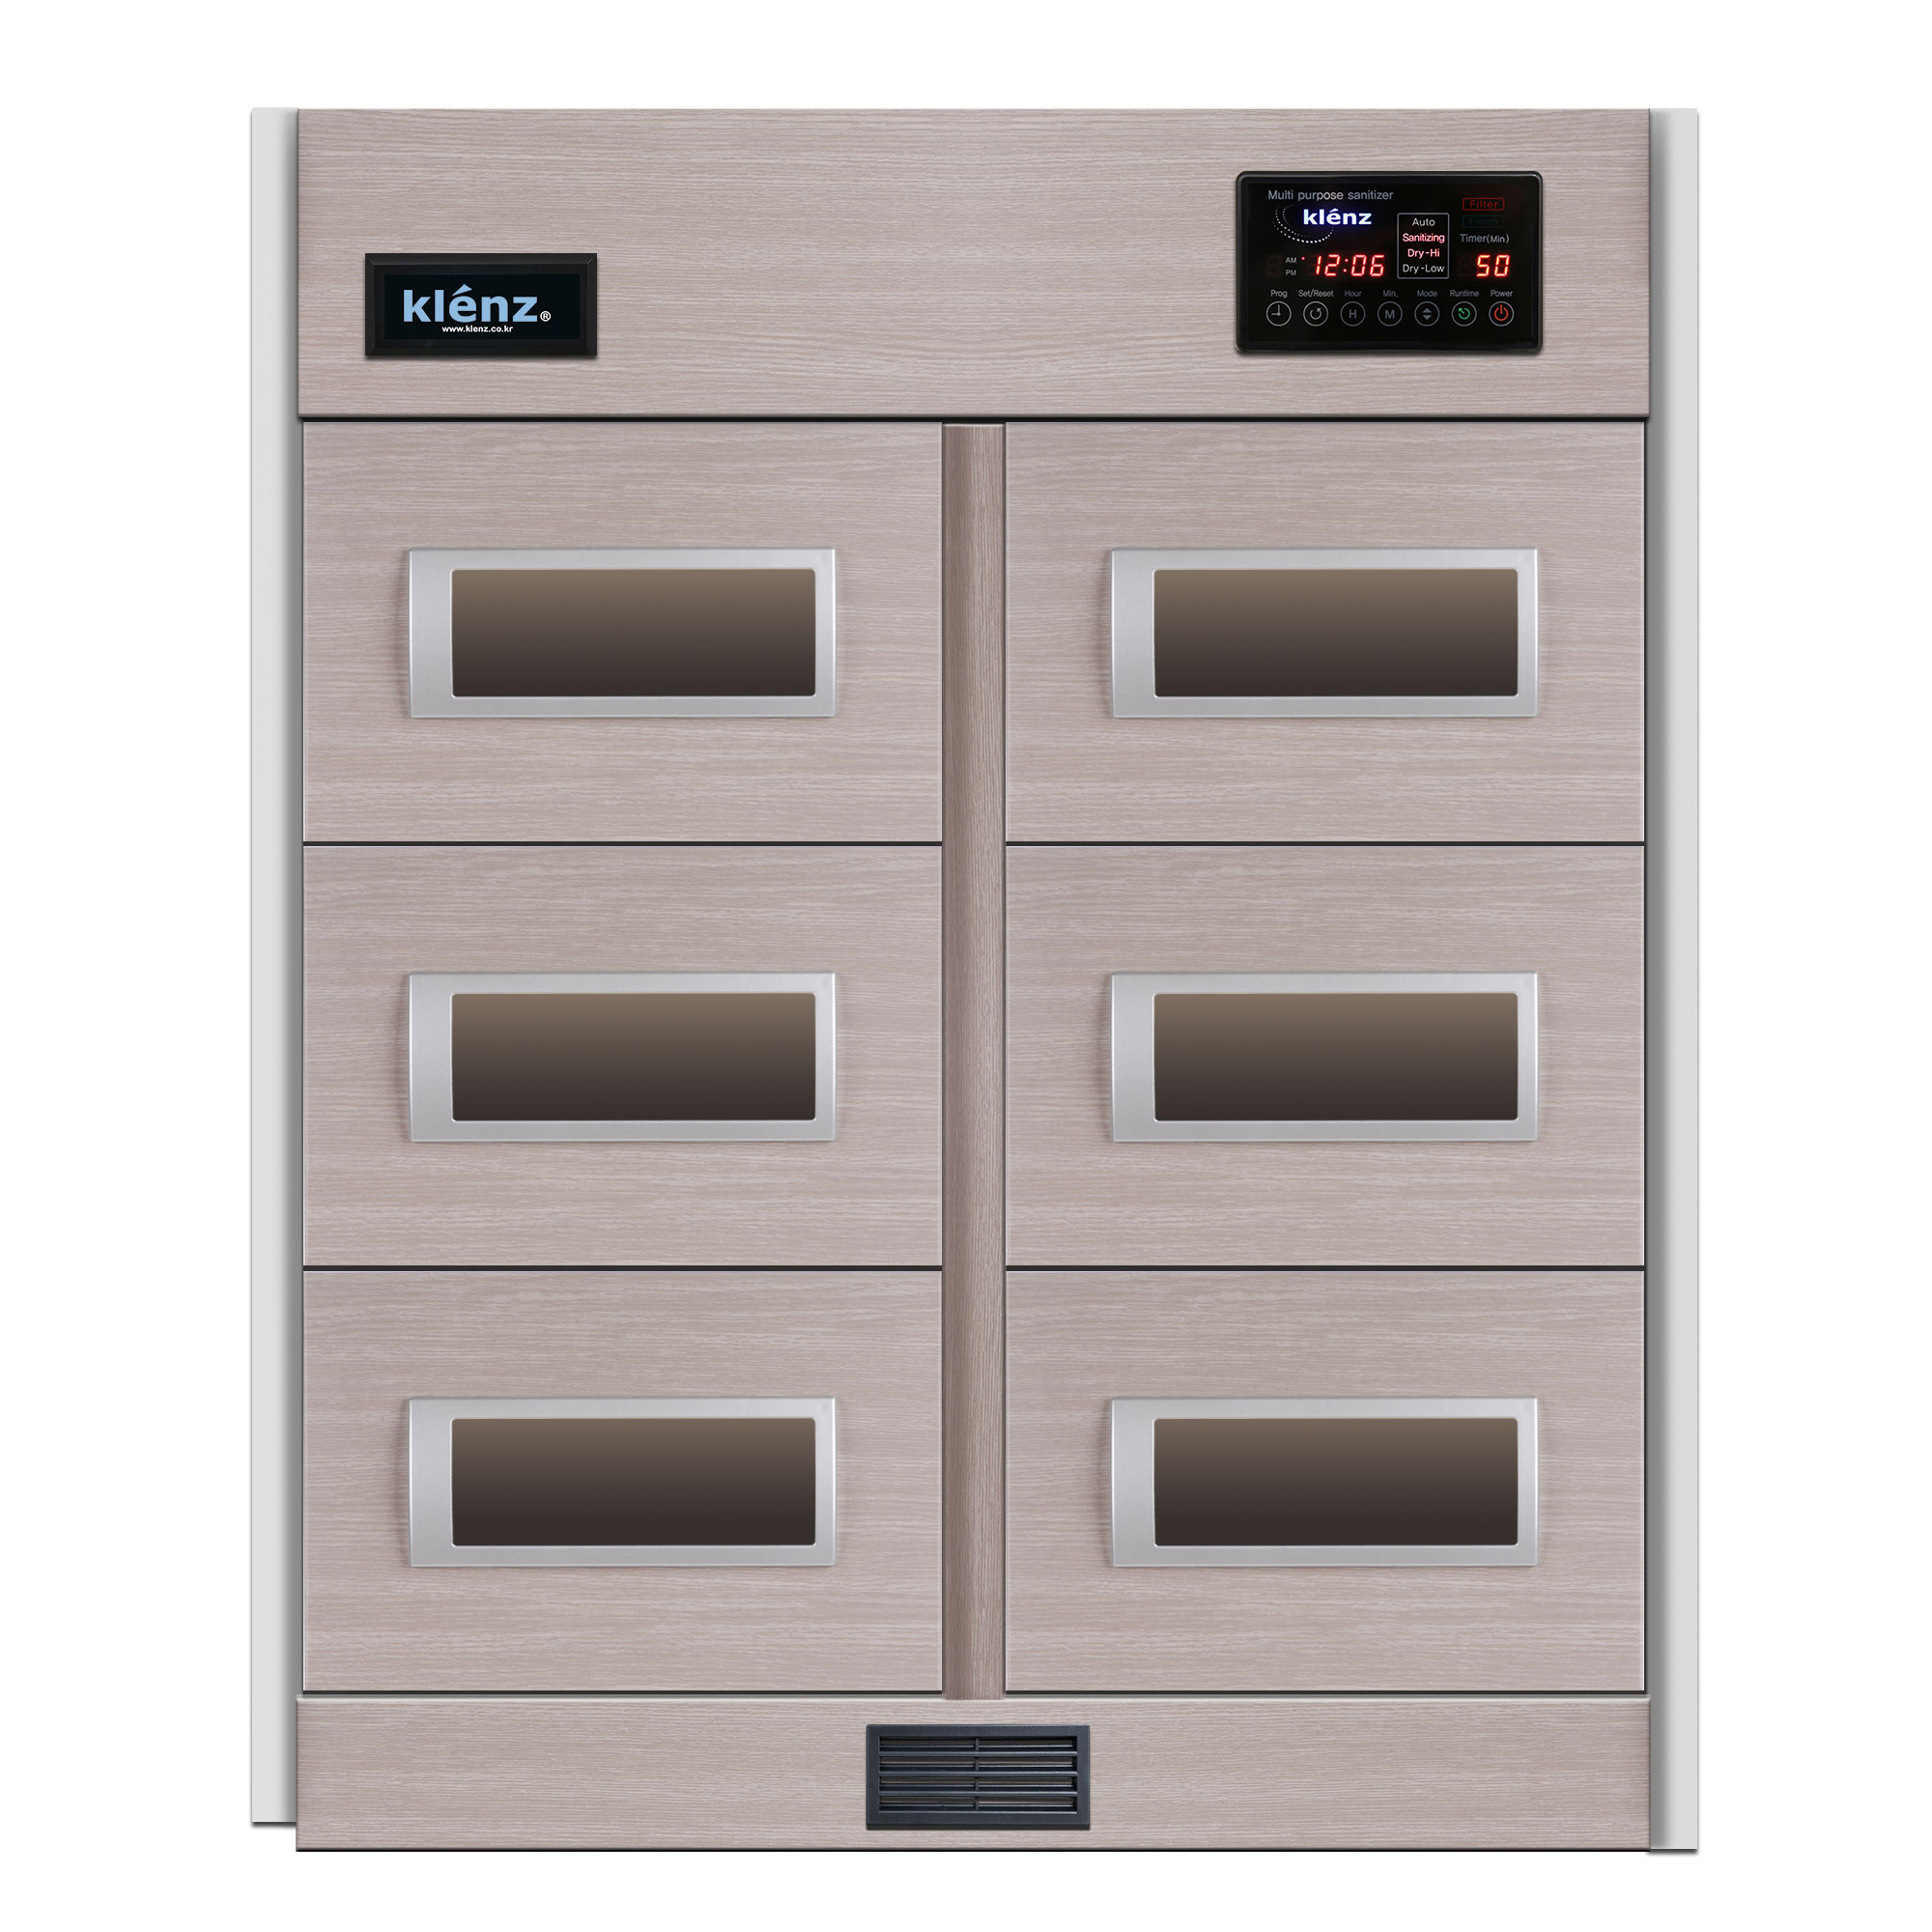 Shoe Dryer Ozone Sterilizer Deodorizer Sanitizer Sterilizer Cabinet Klenz    Buy Korea,Electric Cabinet,Sanitary Cabinet Product On Alibaba.com